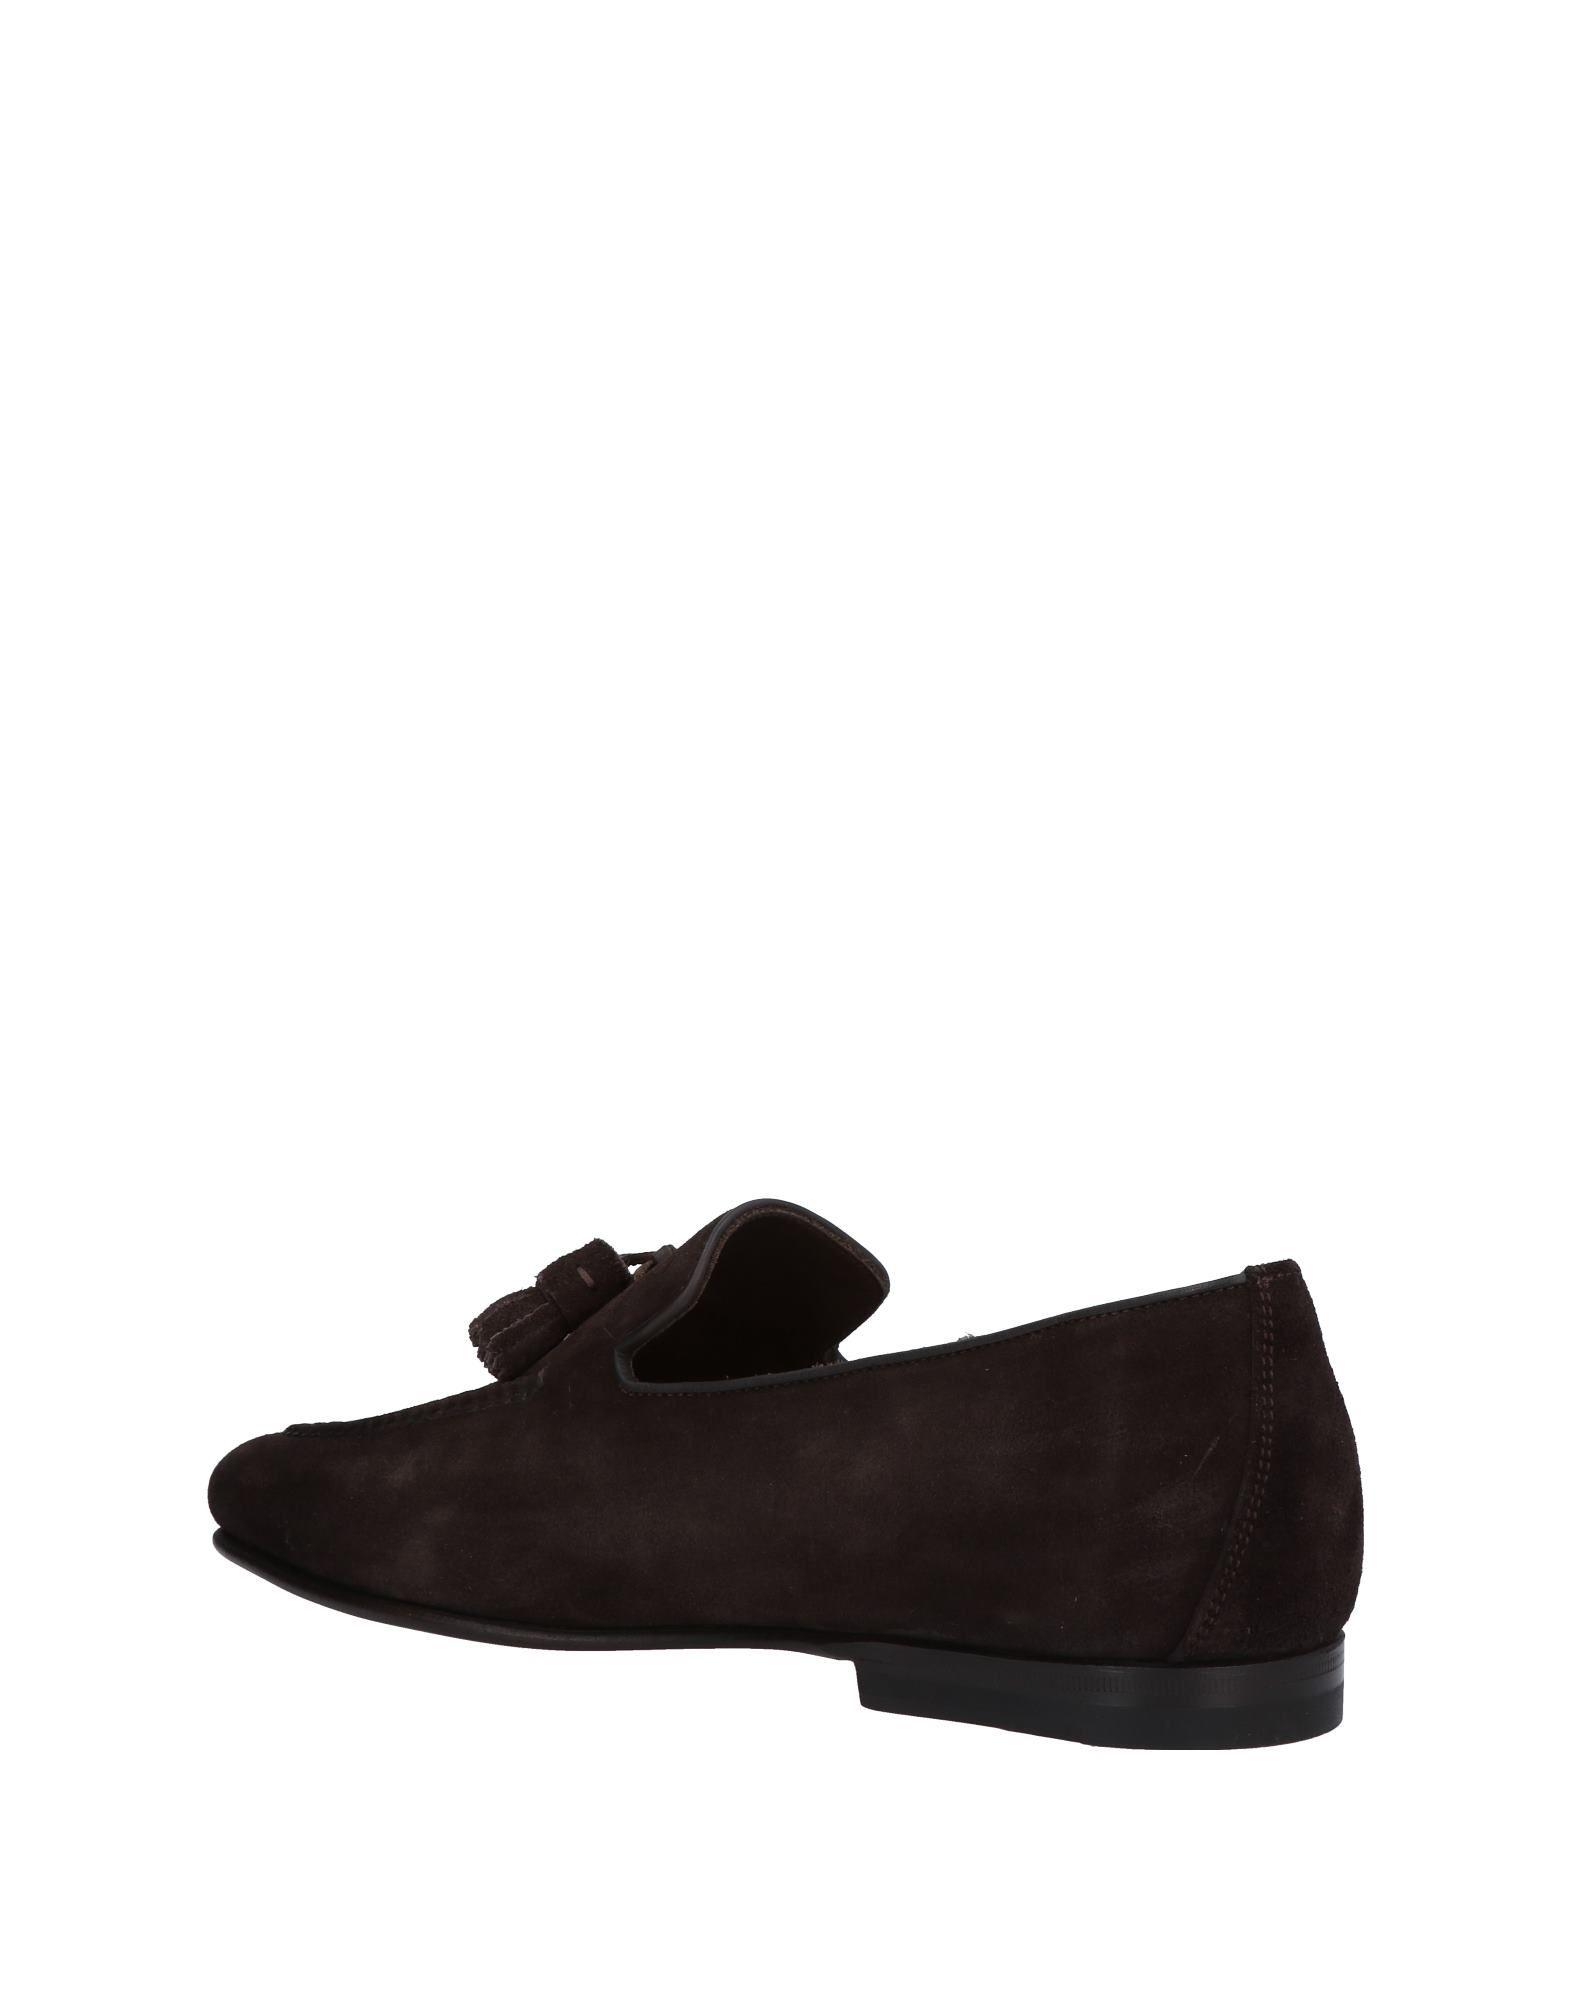 Santoni Mokassins Qualität Herren  11478752AM Gute Qualität Mokassins beliebte Schuhe c47f00